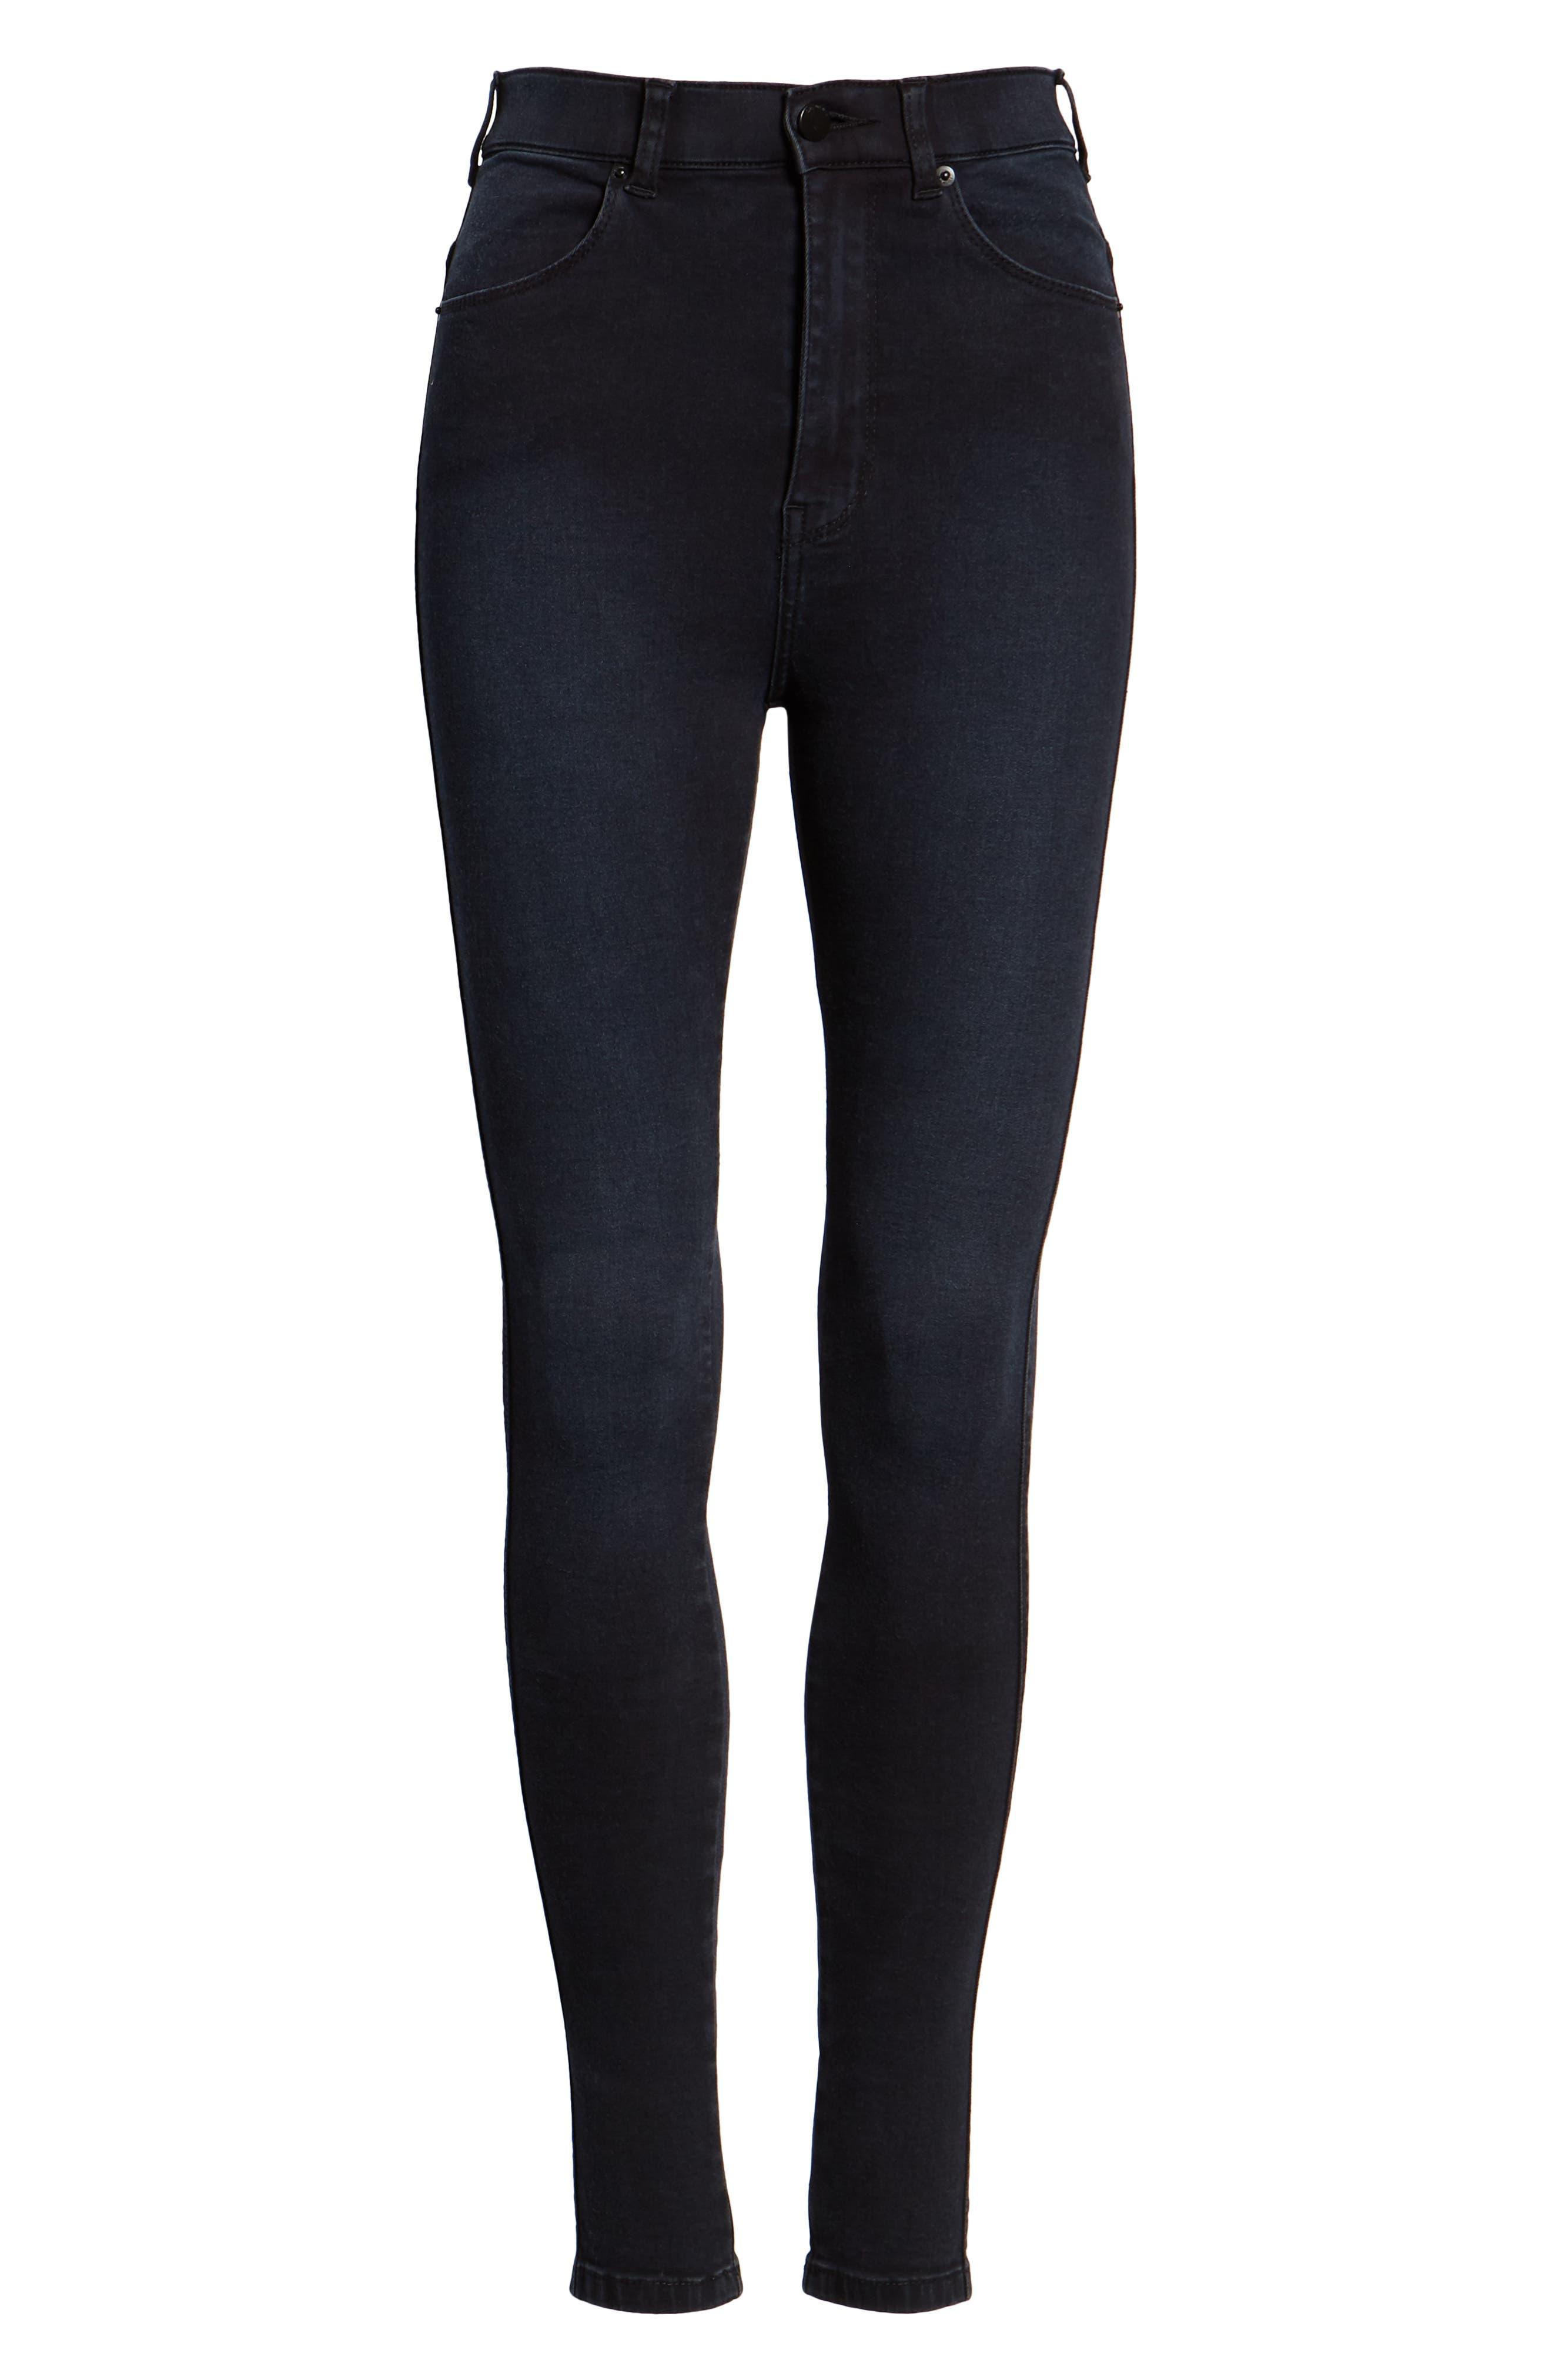 Moxy Skinny Jeans,                             Alternate thumbnail 7, color,                             PITCH DARK BLUE